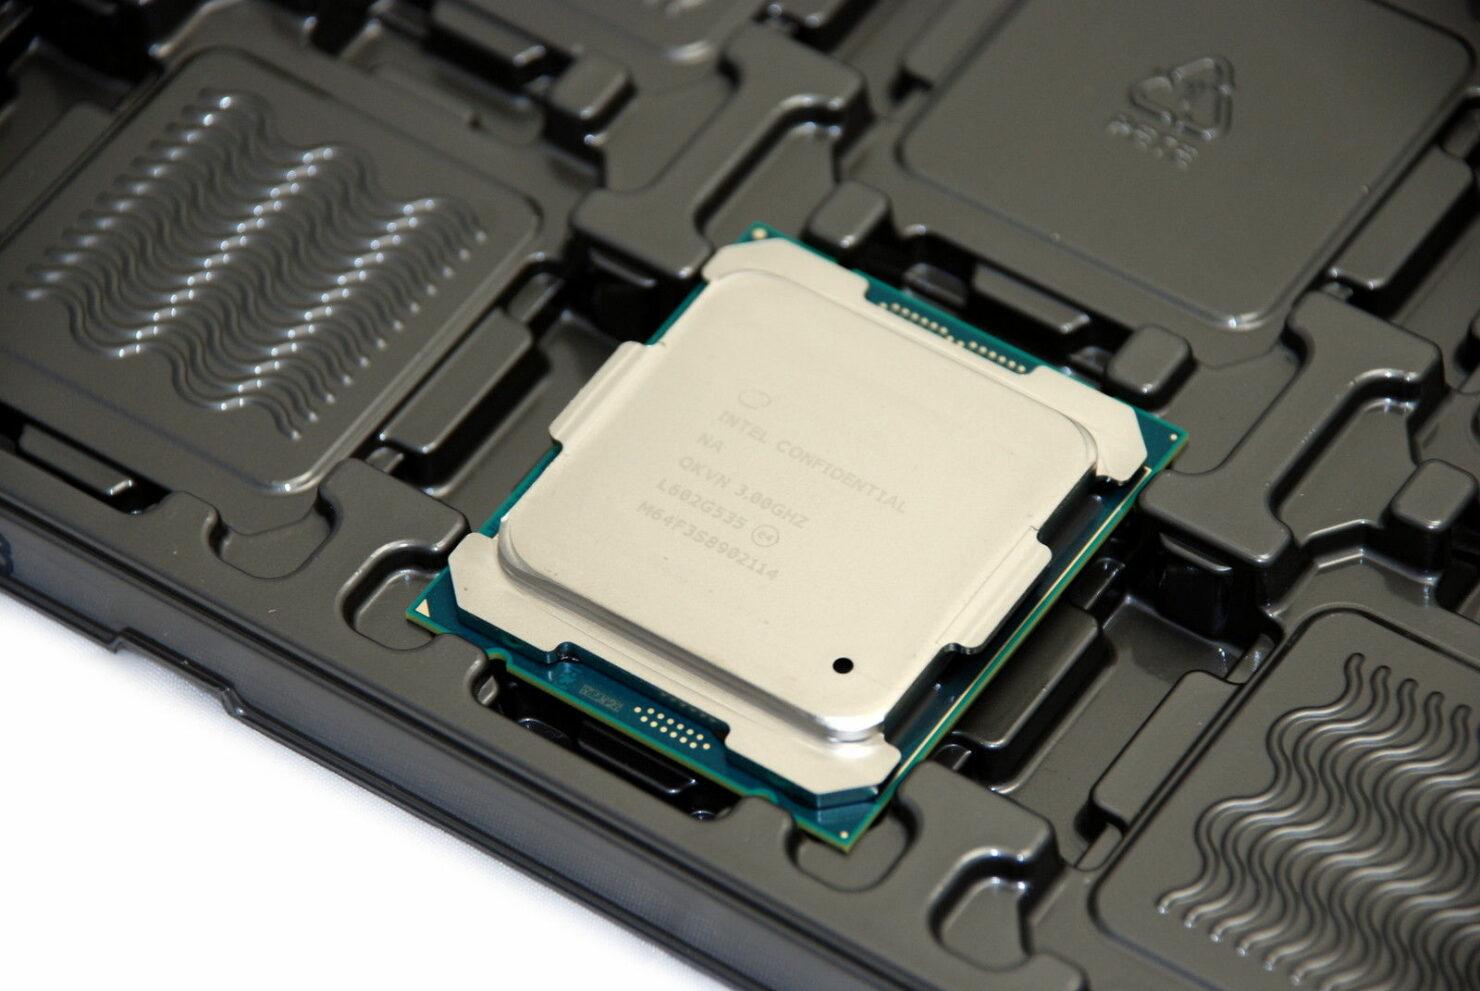 intel-core-i7-6950x_2